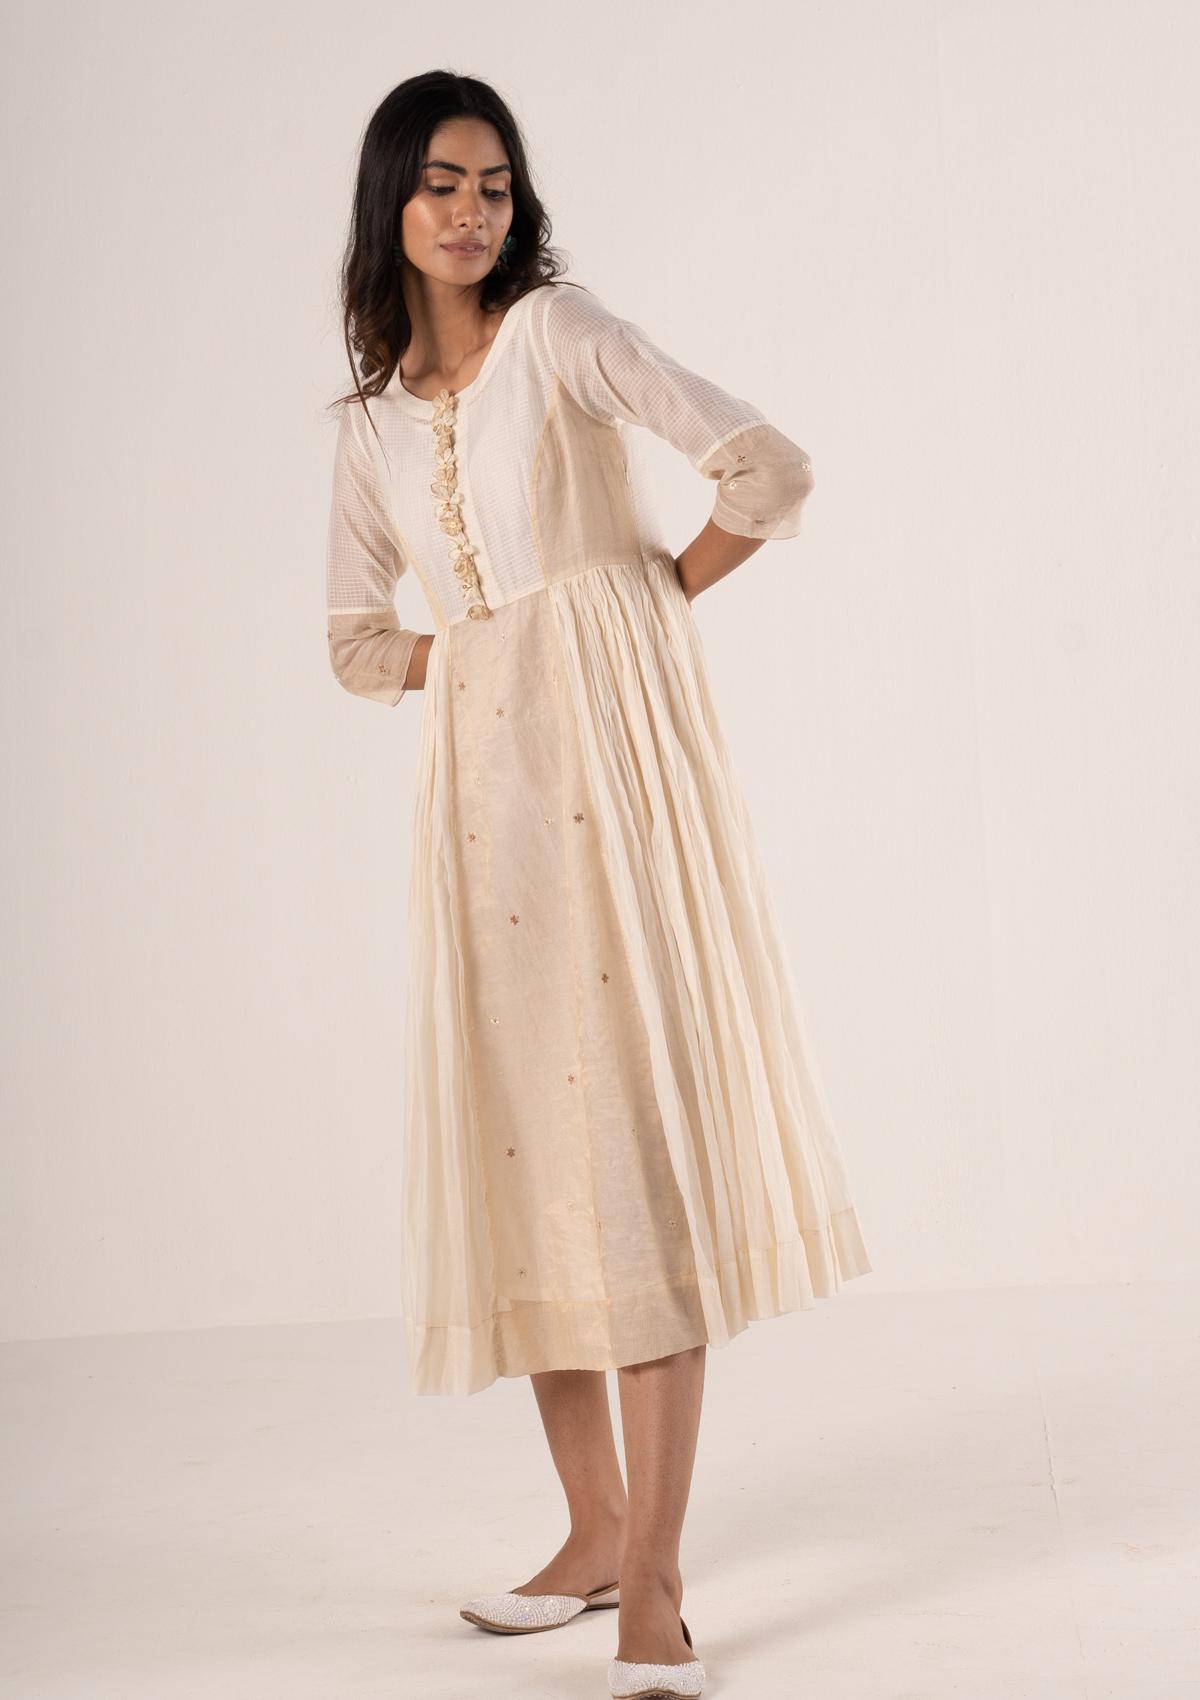 Alpo Ivory Dress